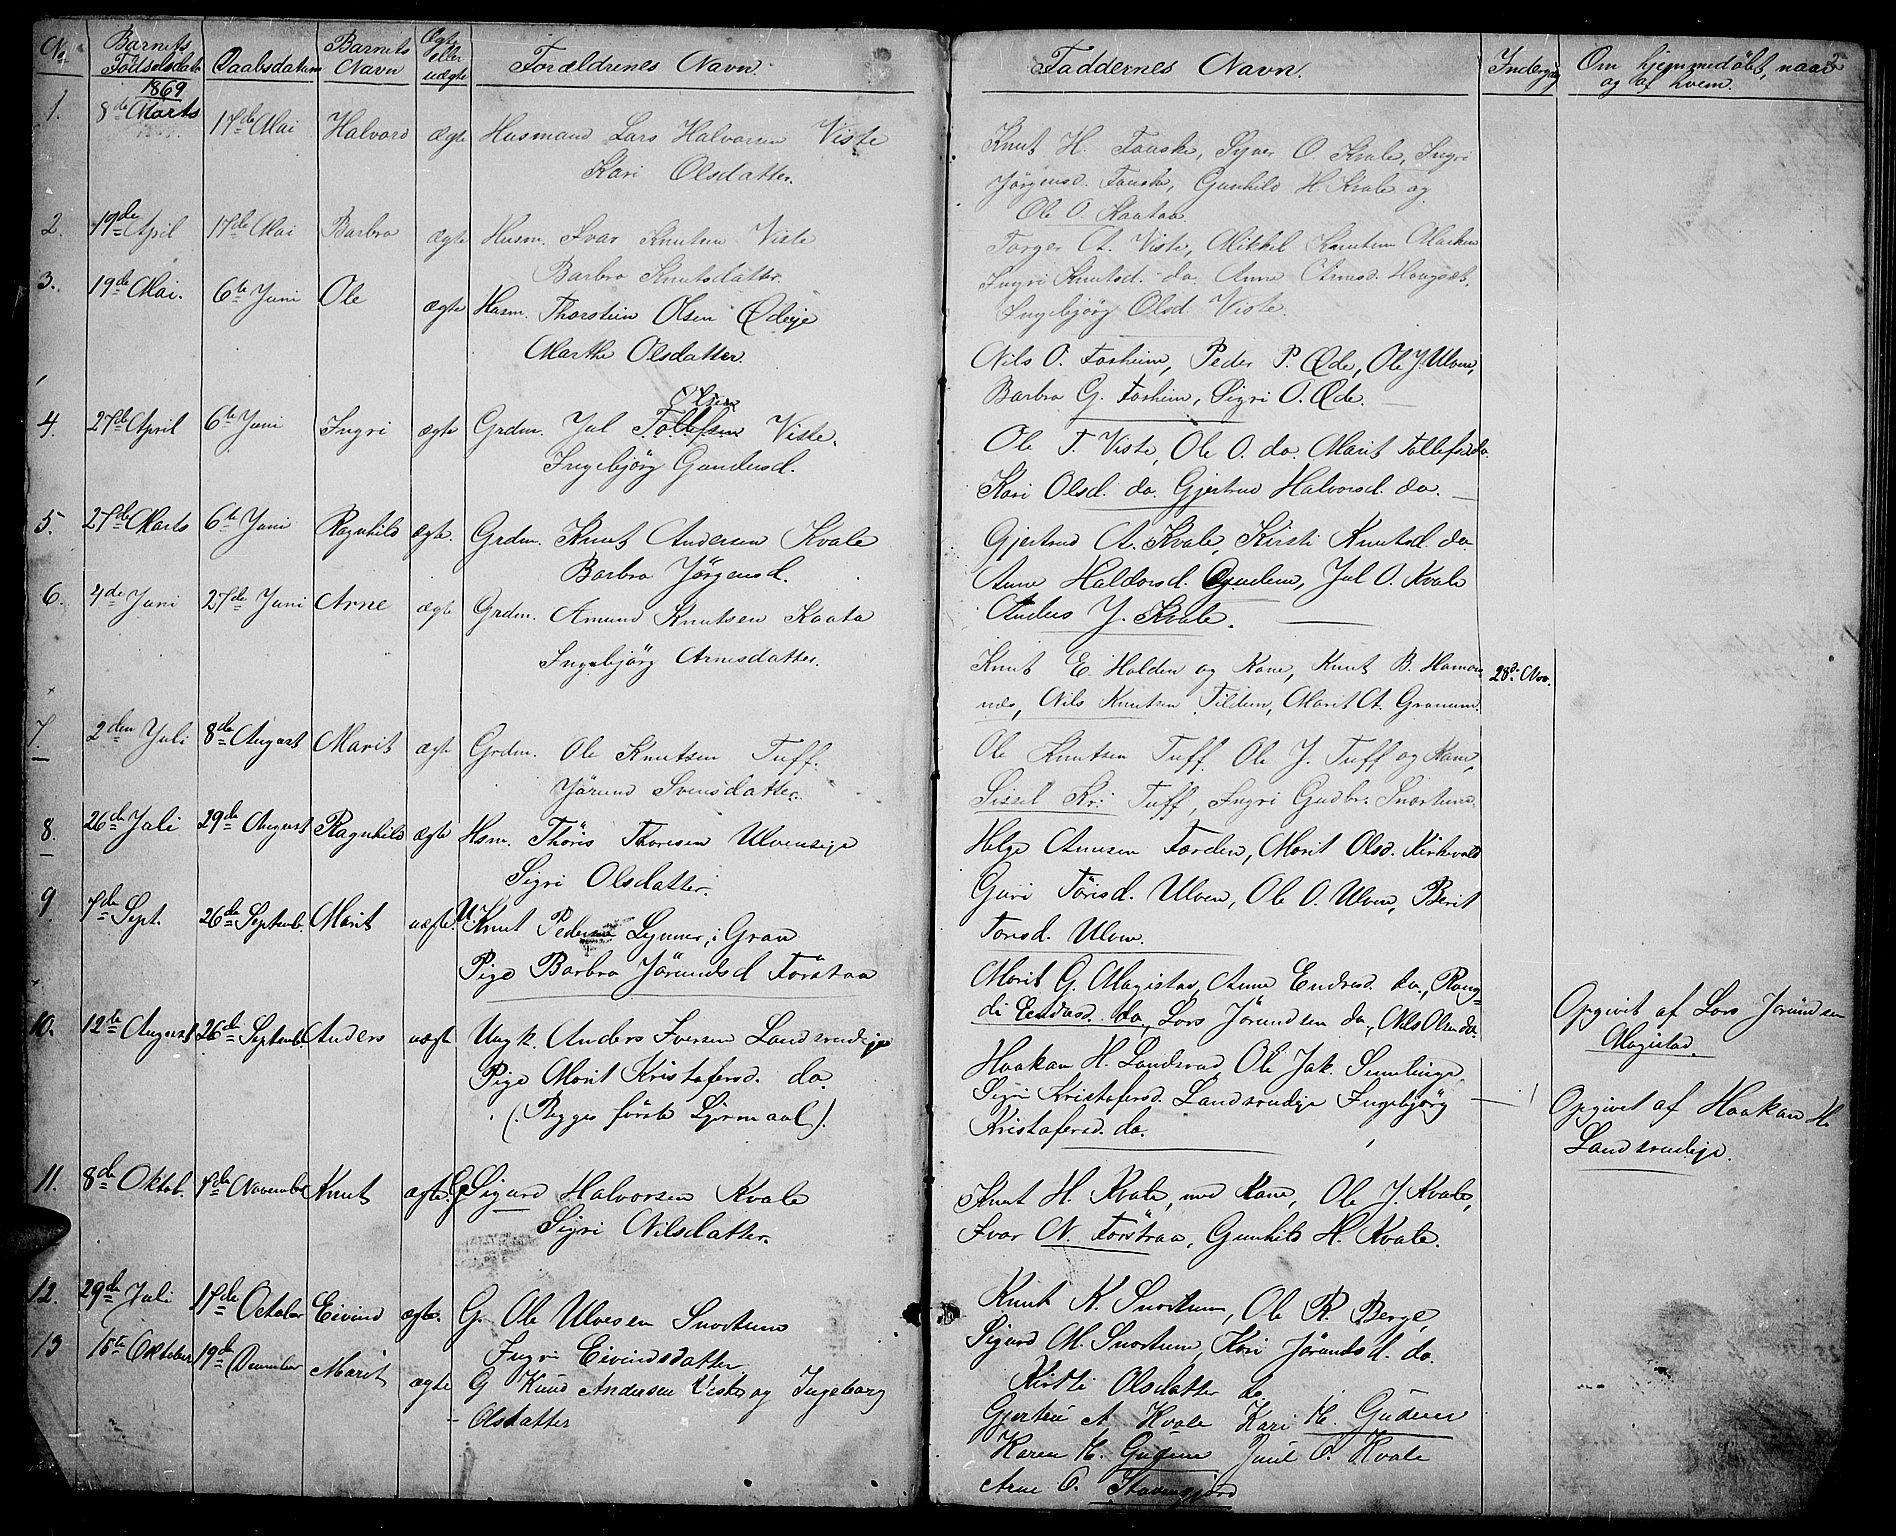 SAH, Vestre Slidre prestekontor, Klokkerbok nr. 3, 1869-1882, s. 2